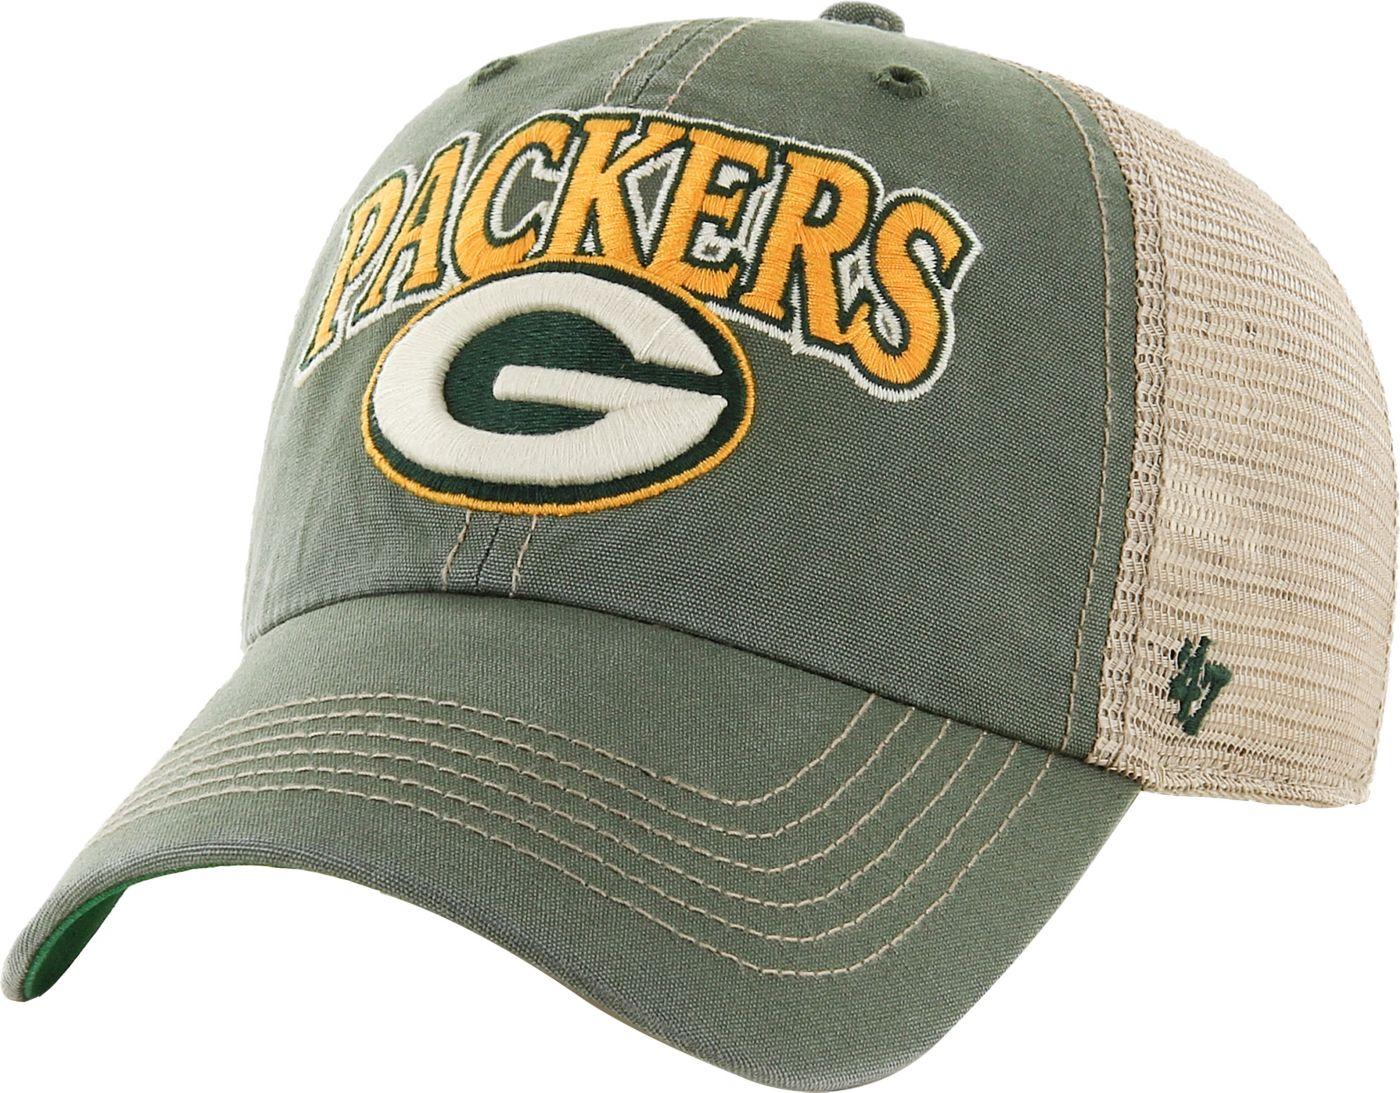 '47 Men's Green Bay Packers Vintage Tuscaloosa Green Adjustable Hat